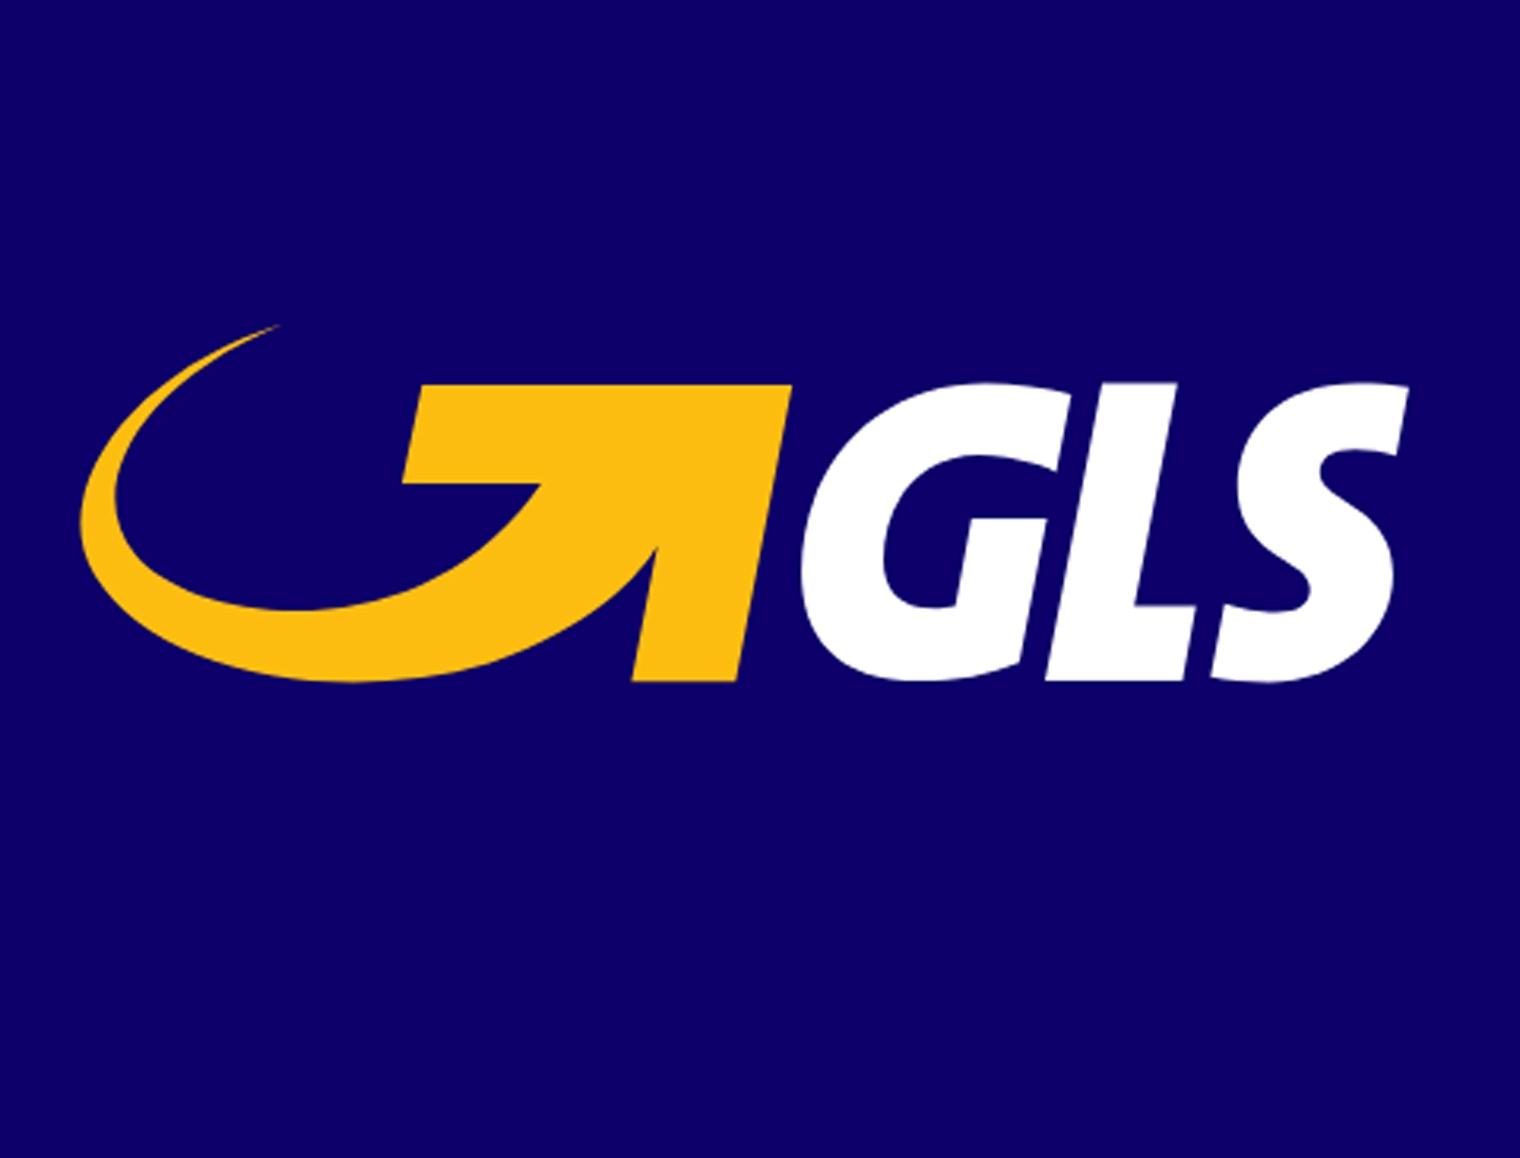 GLS Tracking - Parcel Tracking Live -  Alltrackingcourier